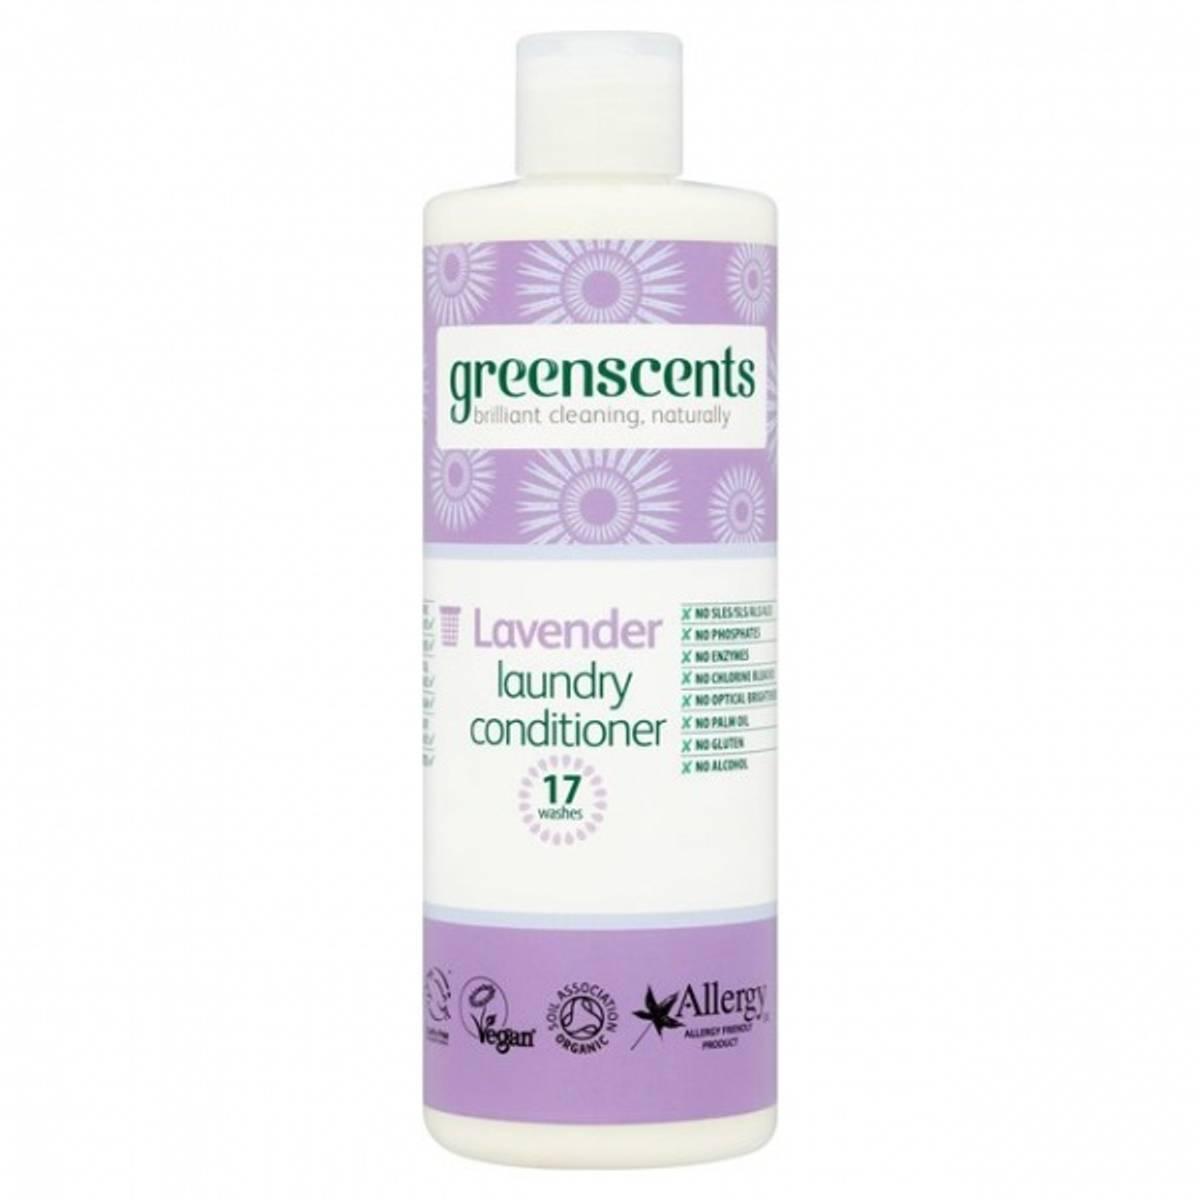 Tøymykner LAVENDEL 400 ml / Greenscents